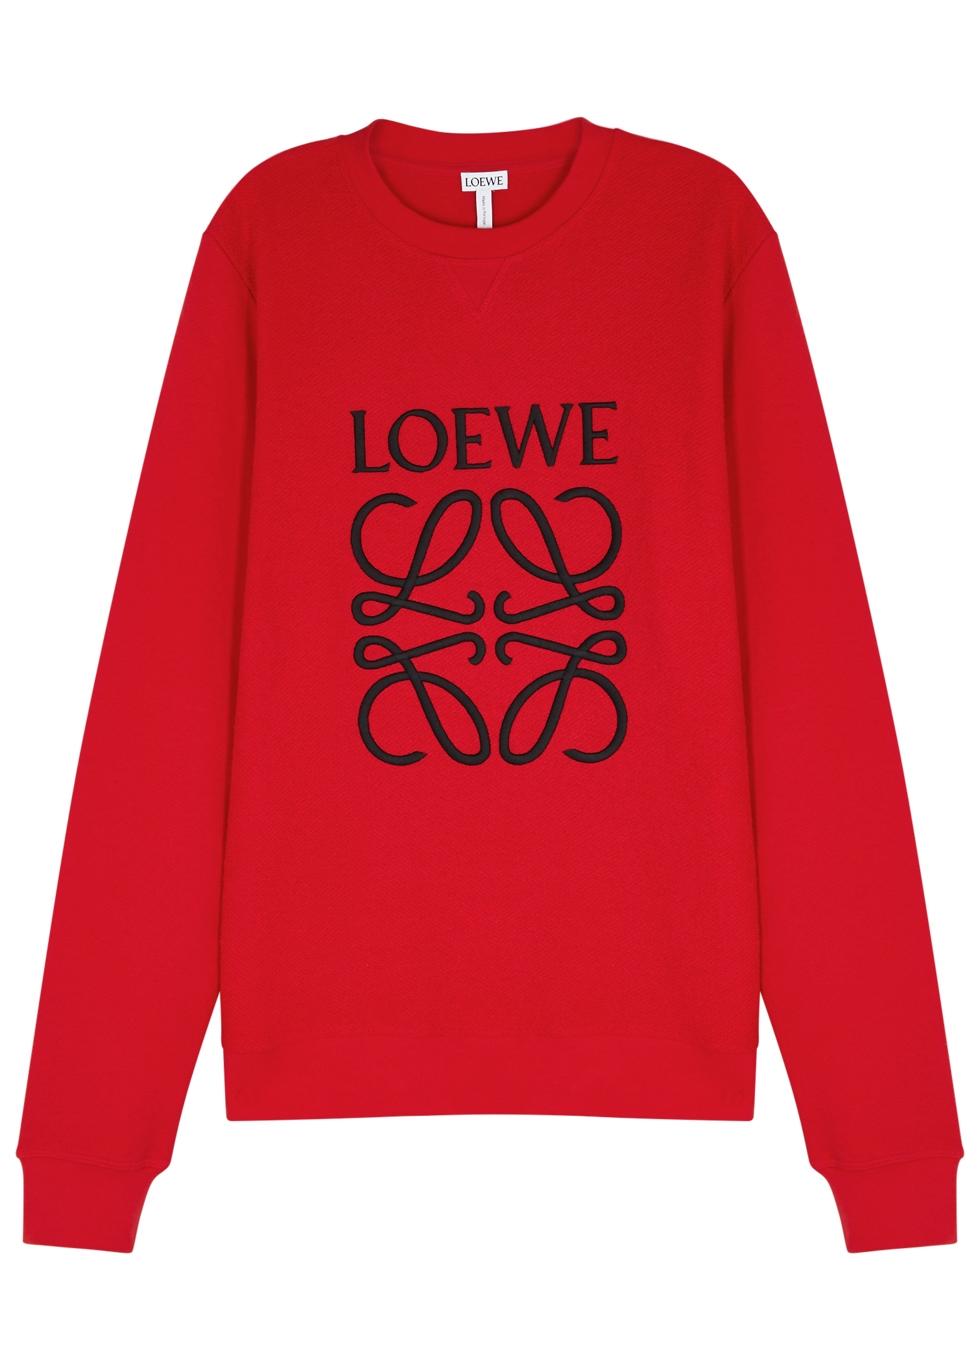 LOEWE RED LOGO-EMBROIDERED COTTON SWEATSHIRT